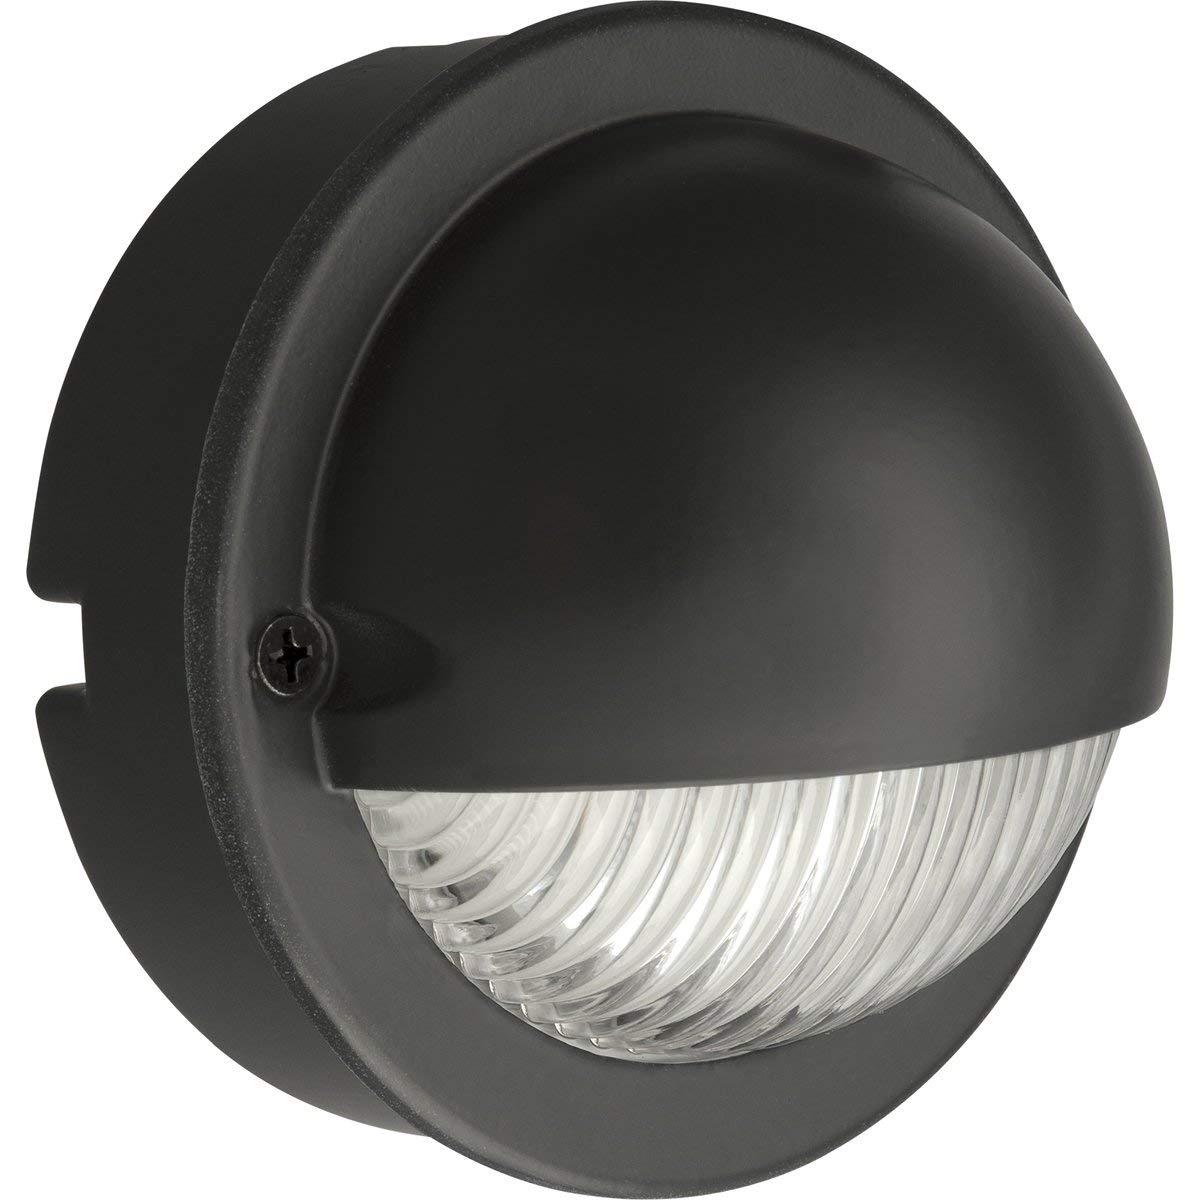 Progress Lighting Black Finish HI Progress Lighting P5296-31 LED Deck Light